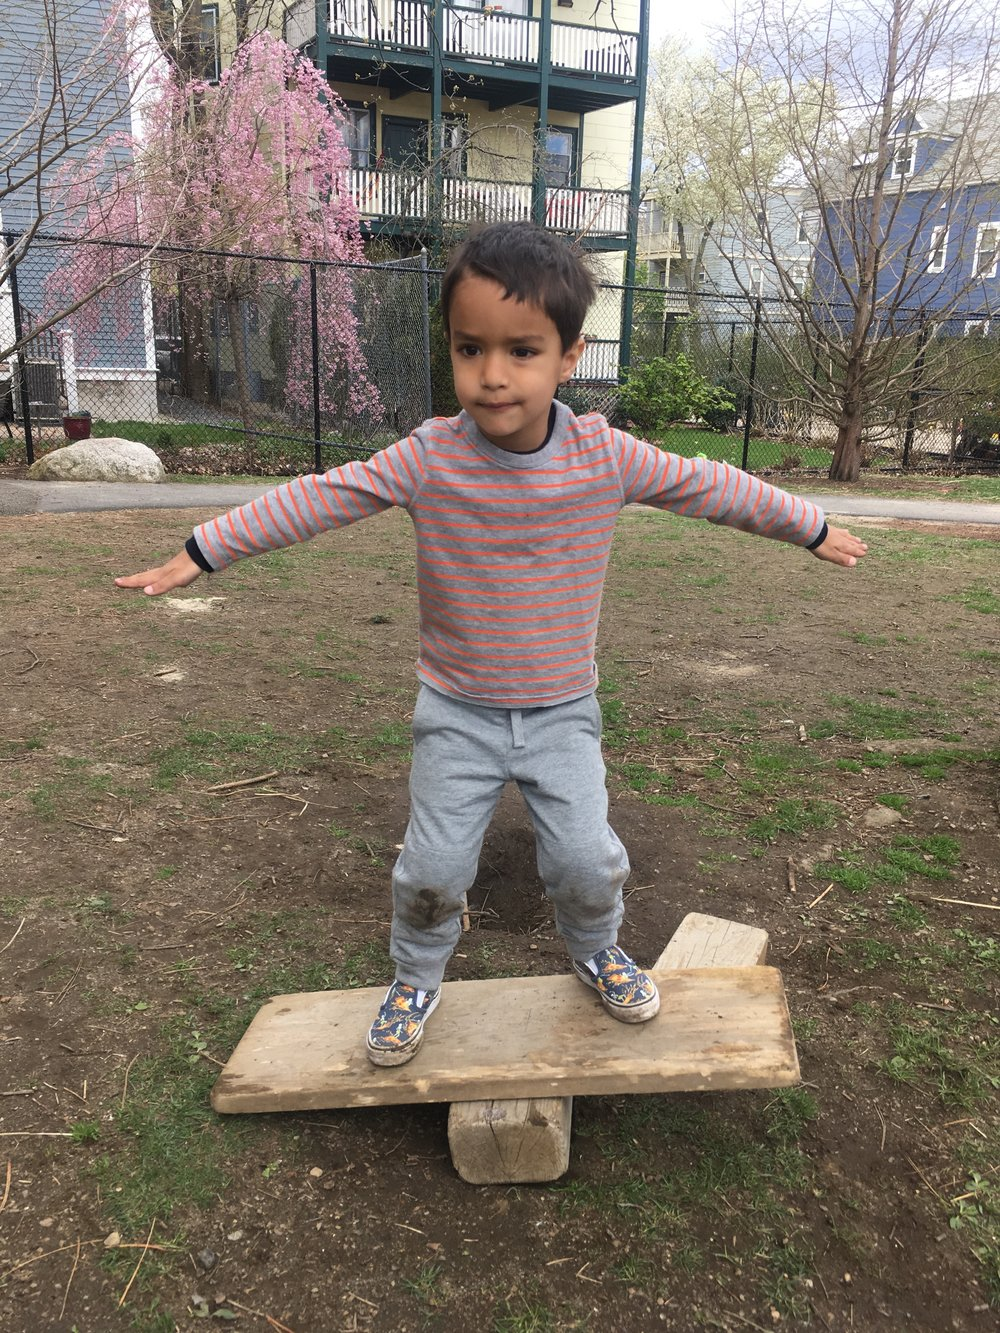 - Balancing